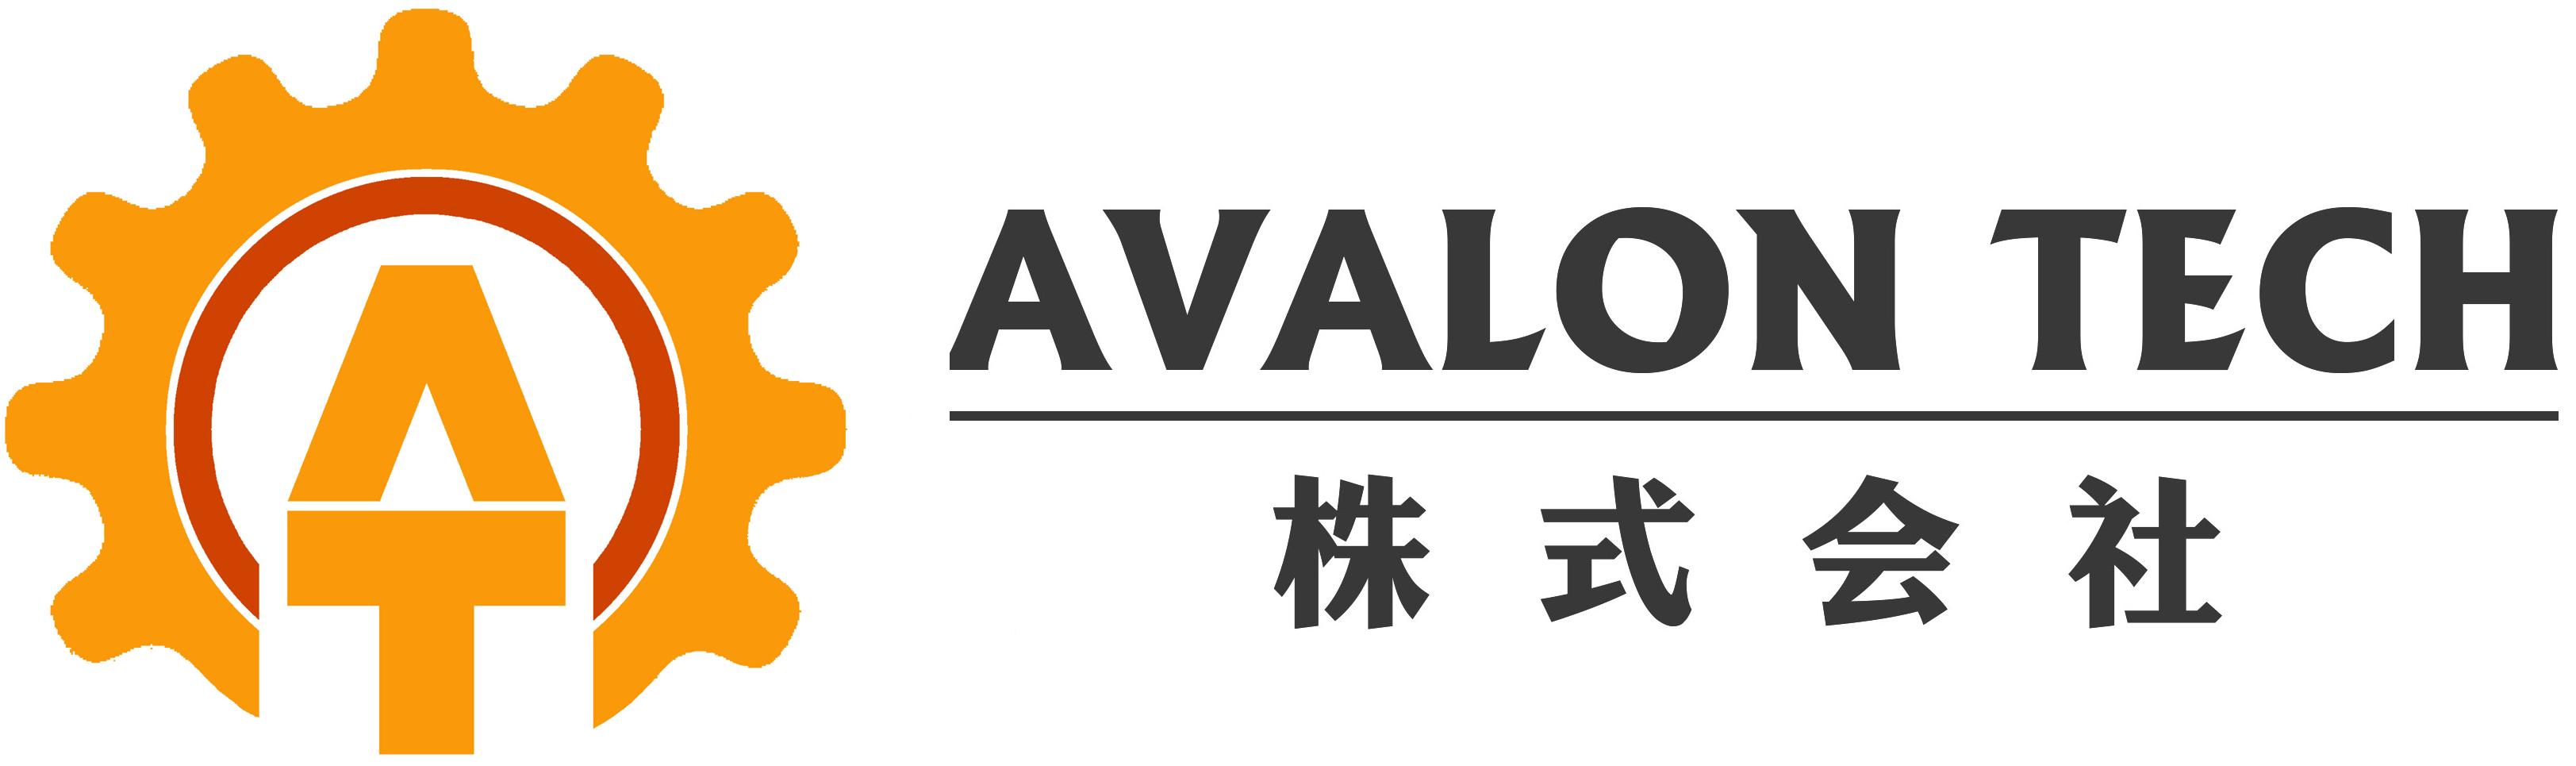 AvalonTech